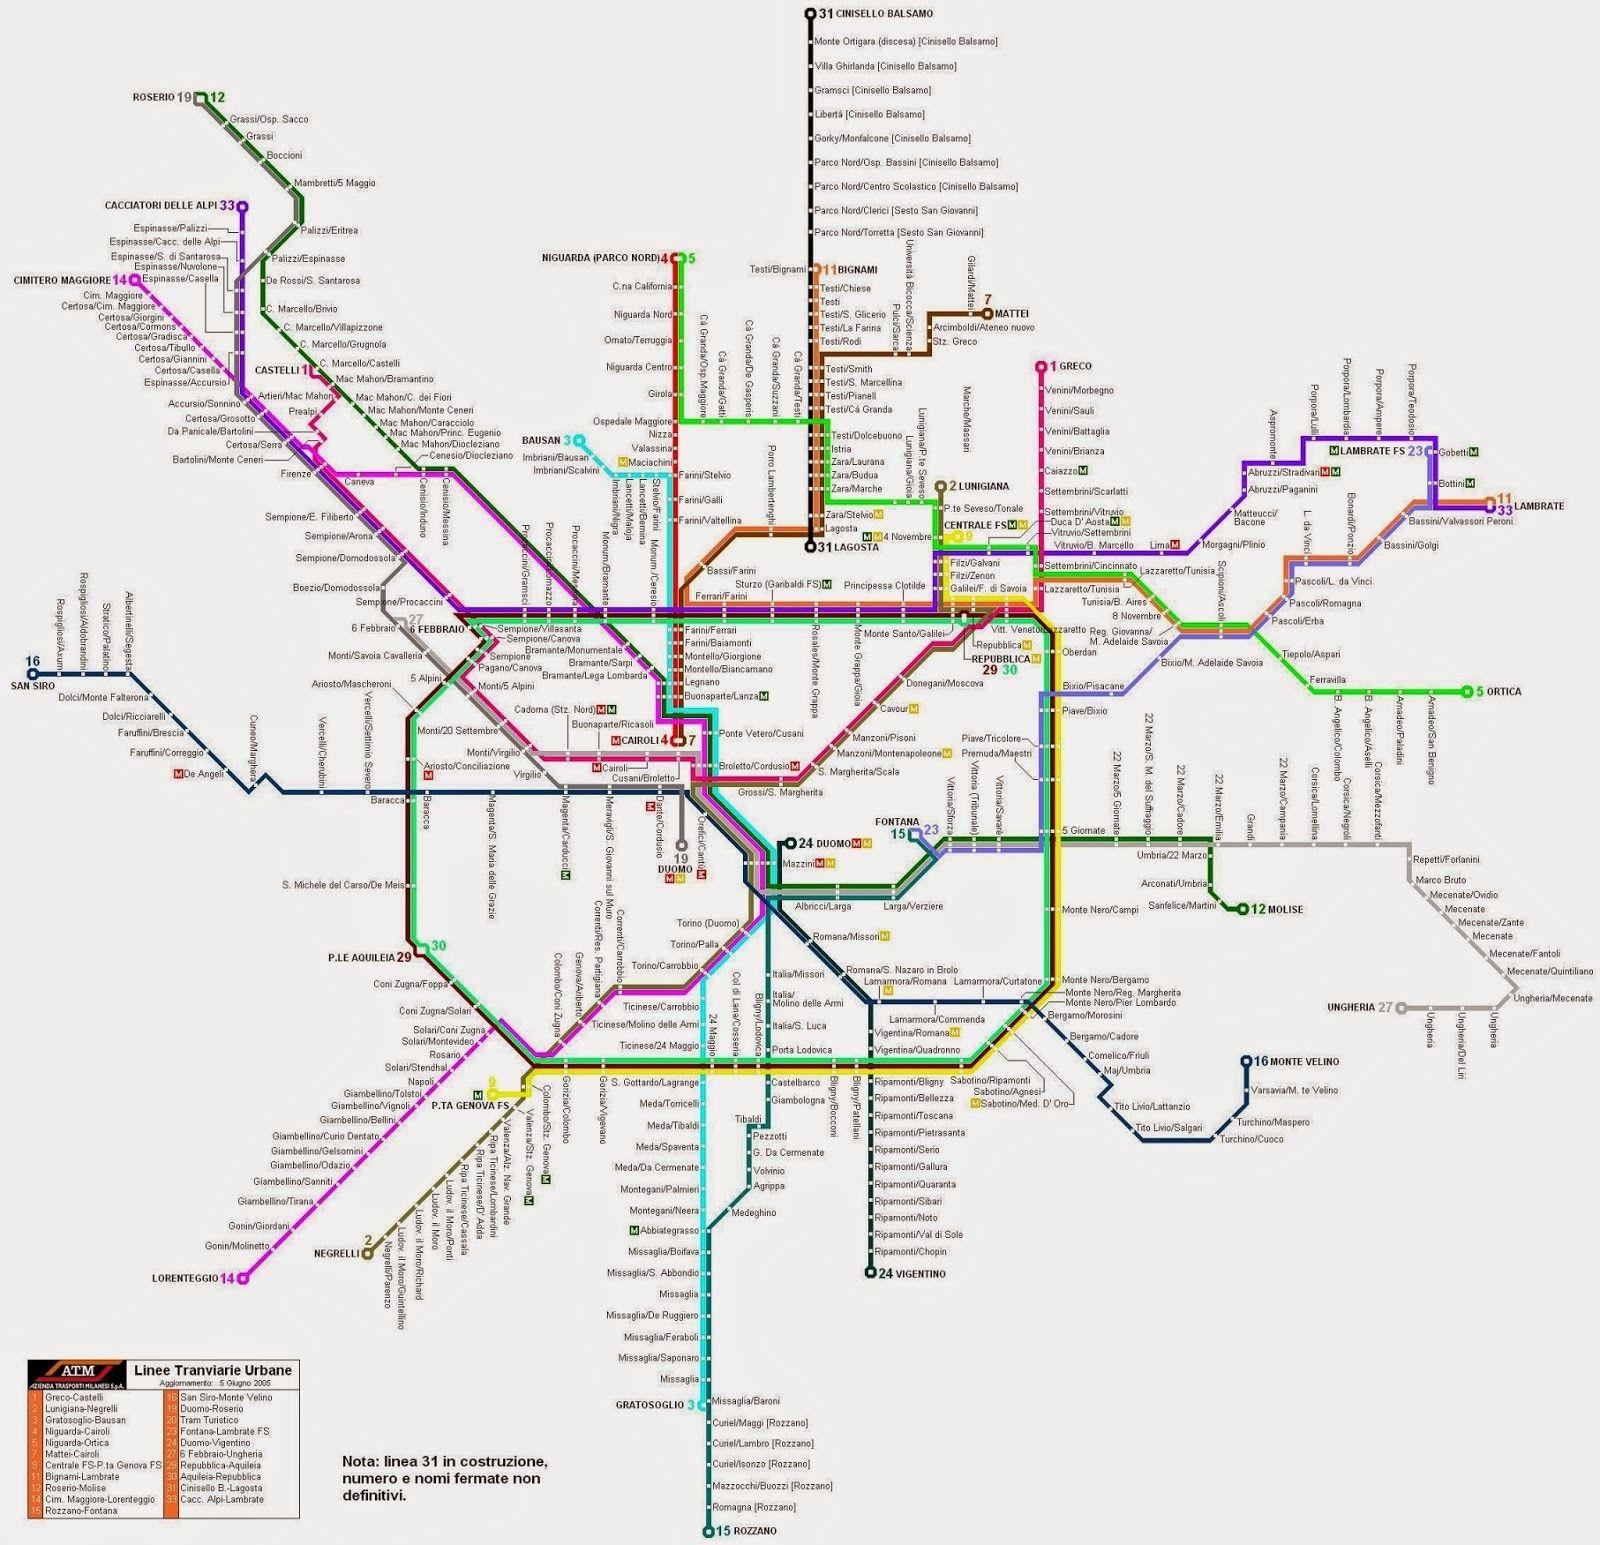 Muero Por Viajar Transporte Público En Milán Mapa Del Metro Milán Transporte